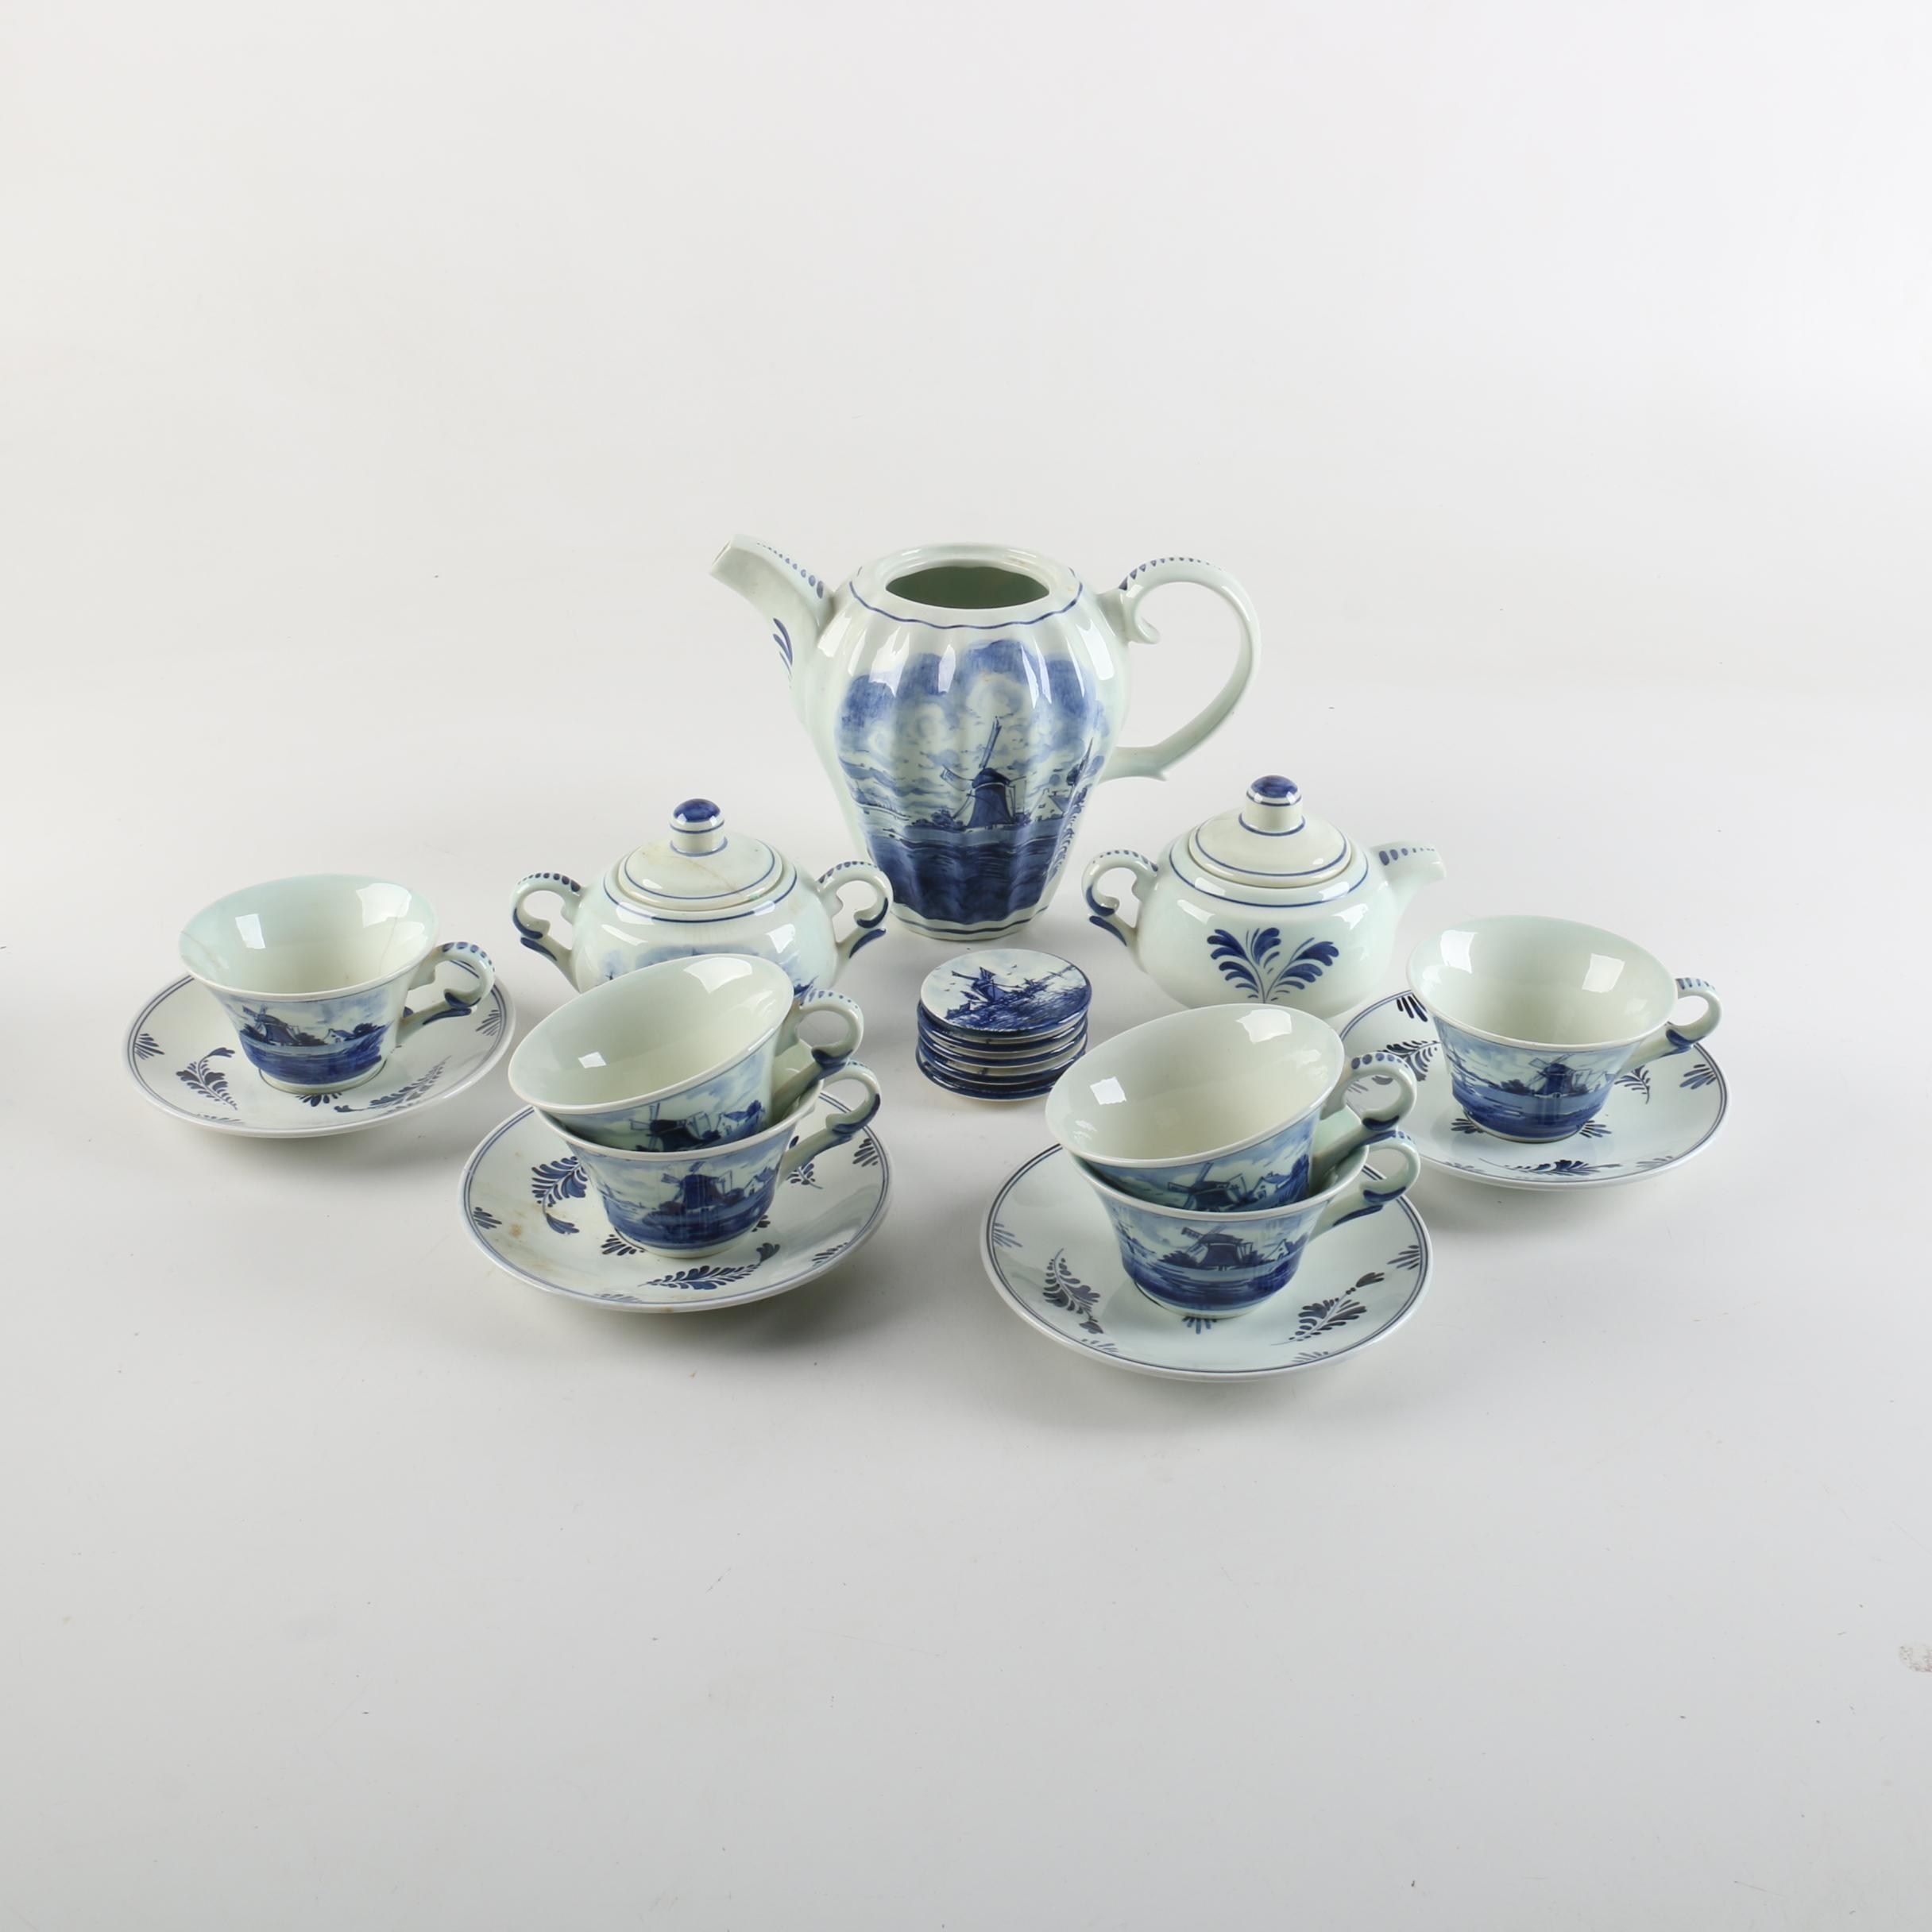 Delft Ceramic Tea Ware